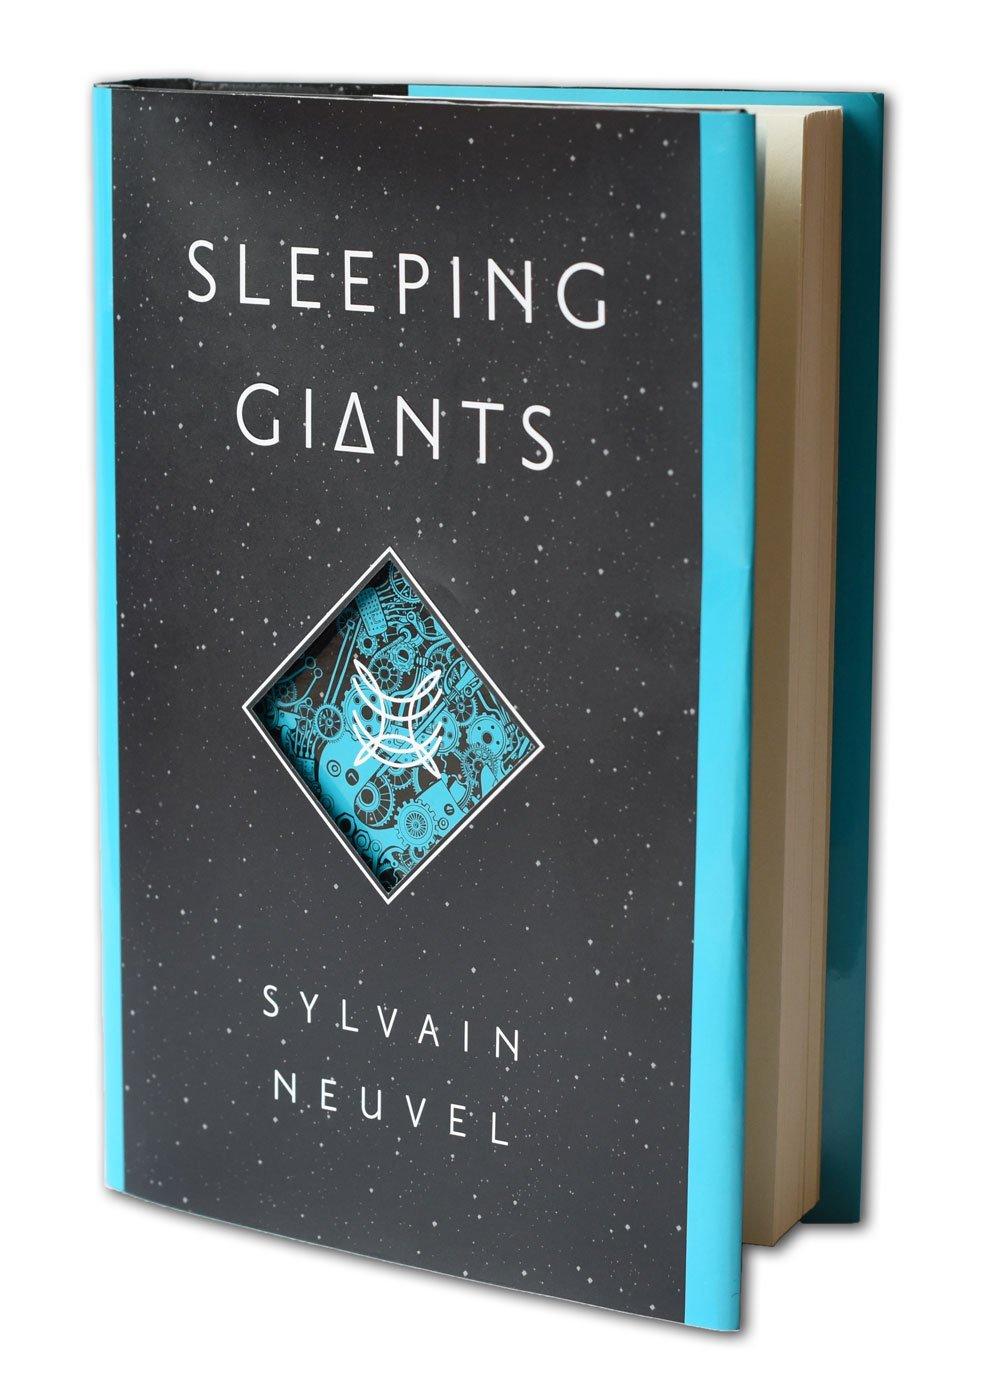 Welcome to Sleeping Giant NY